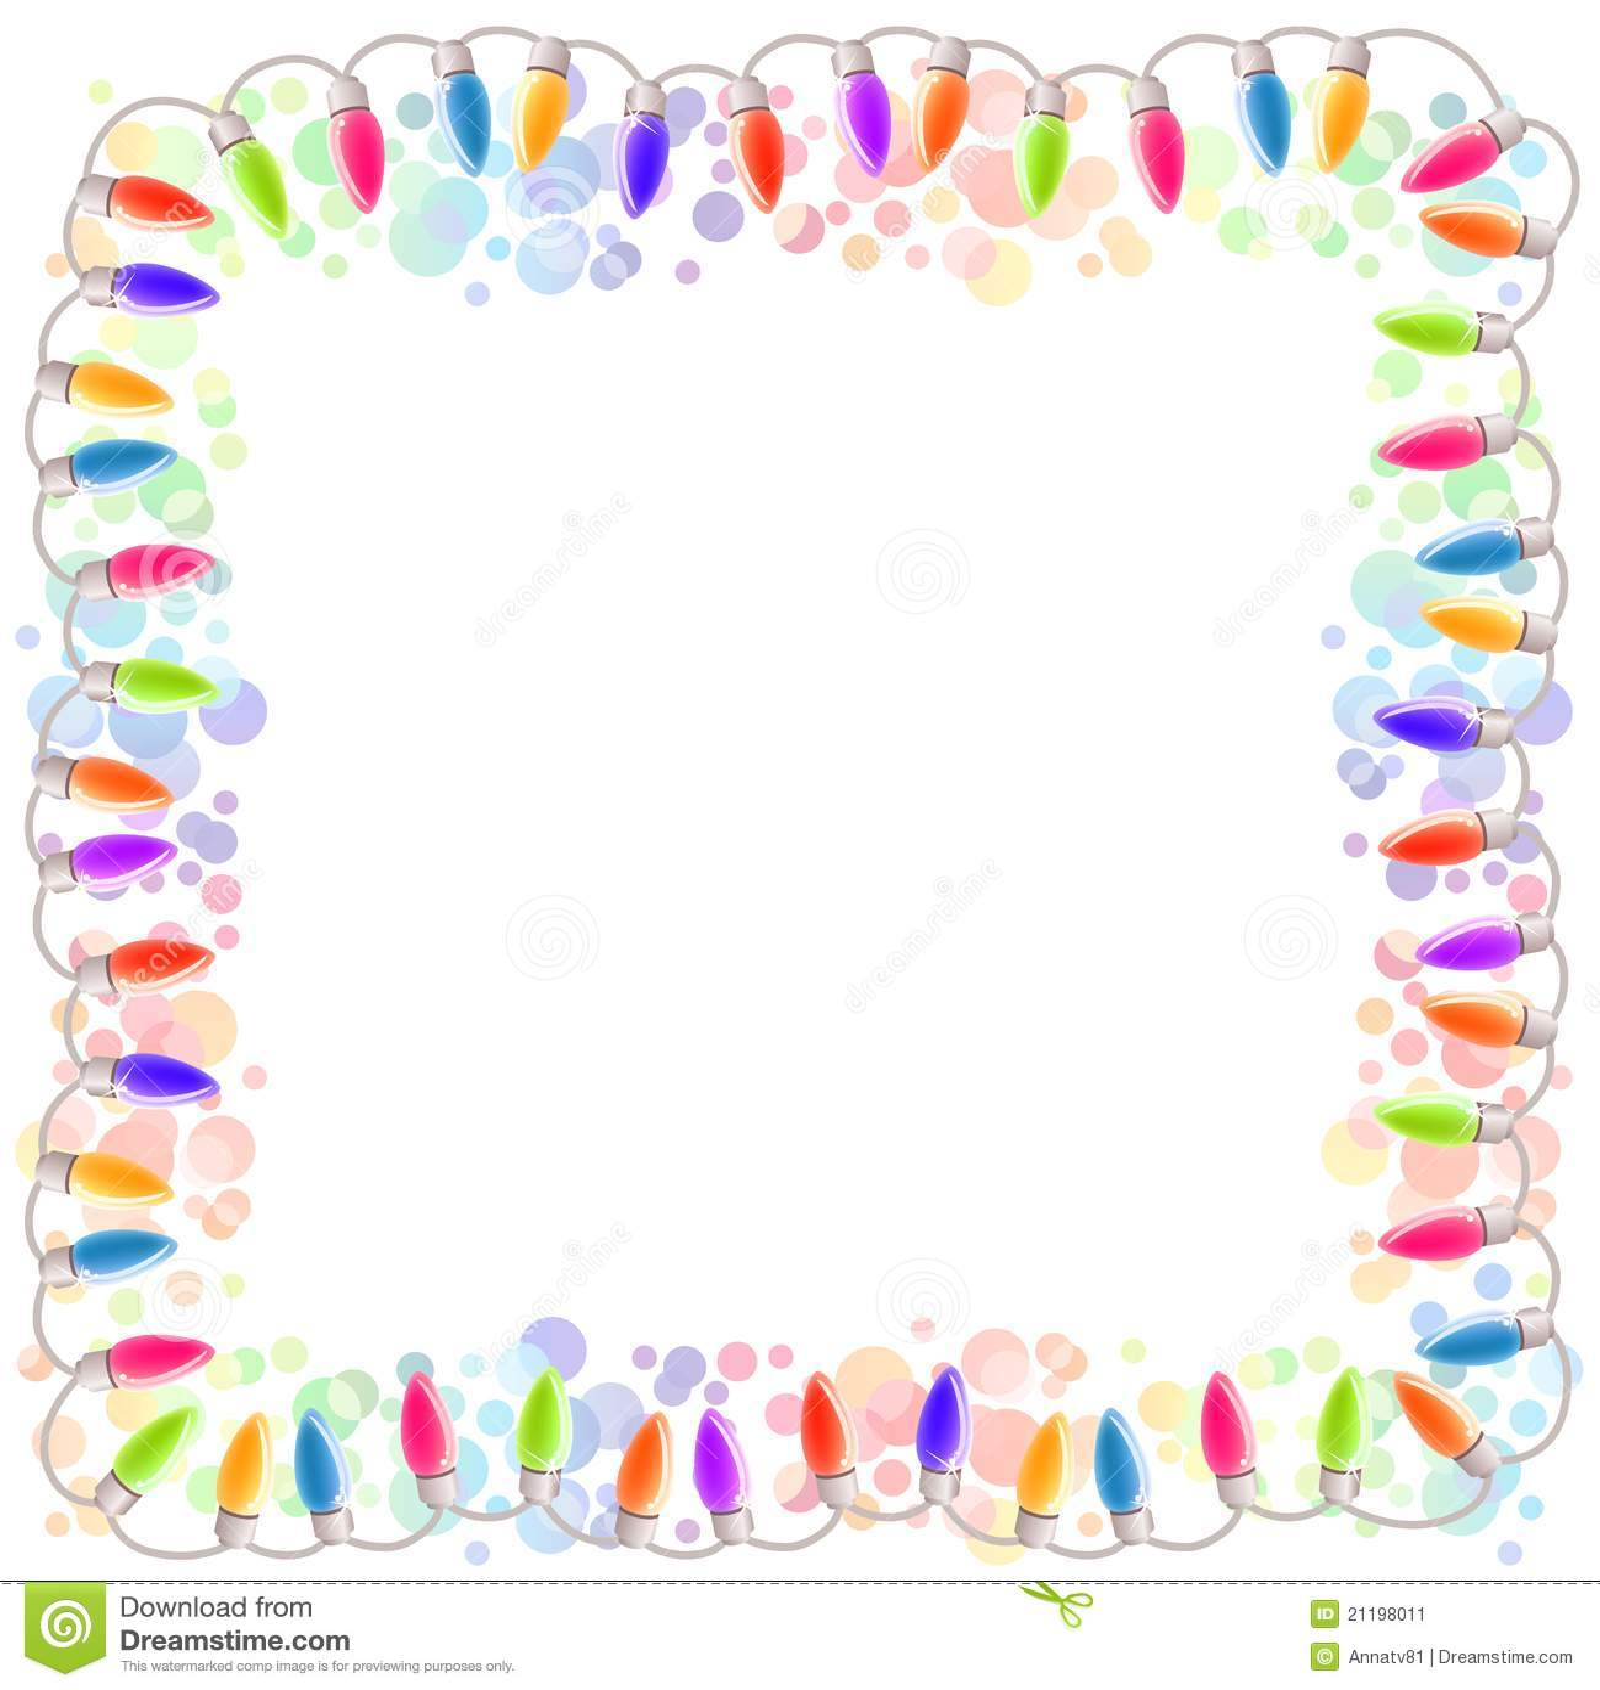 Festive blank frame with garland